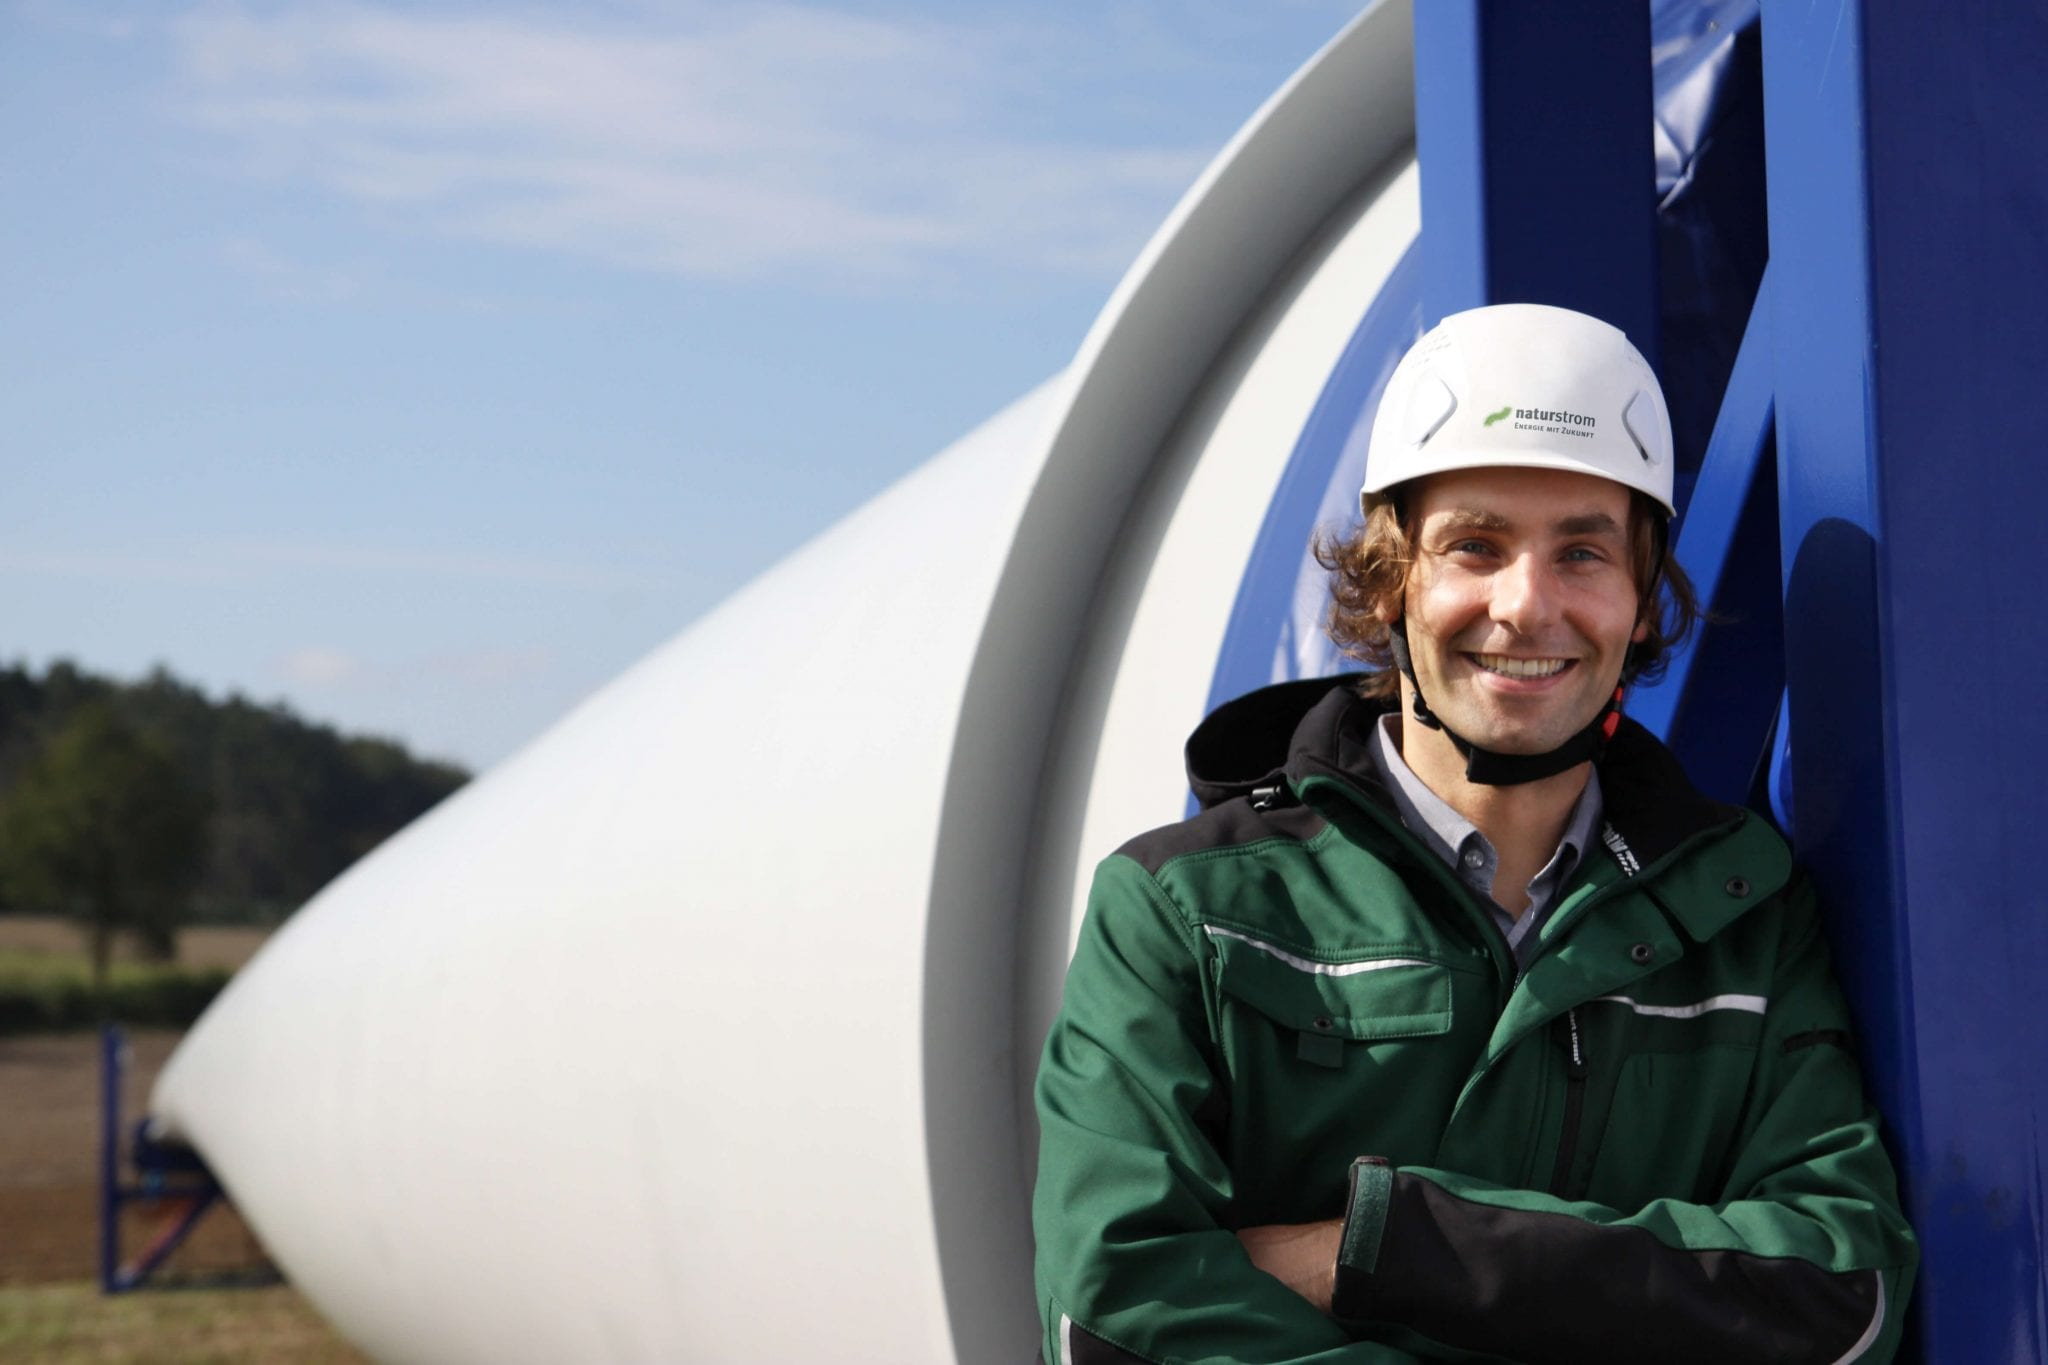 Windkraft_Max Wackwitz_Arbeiten bei Naturstrom